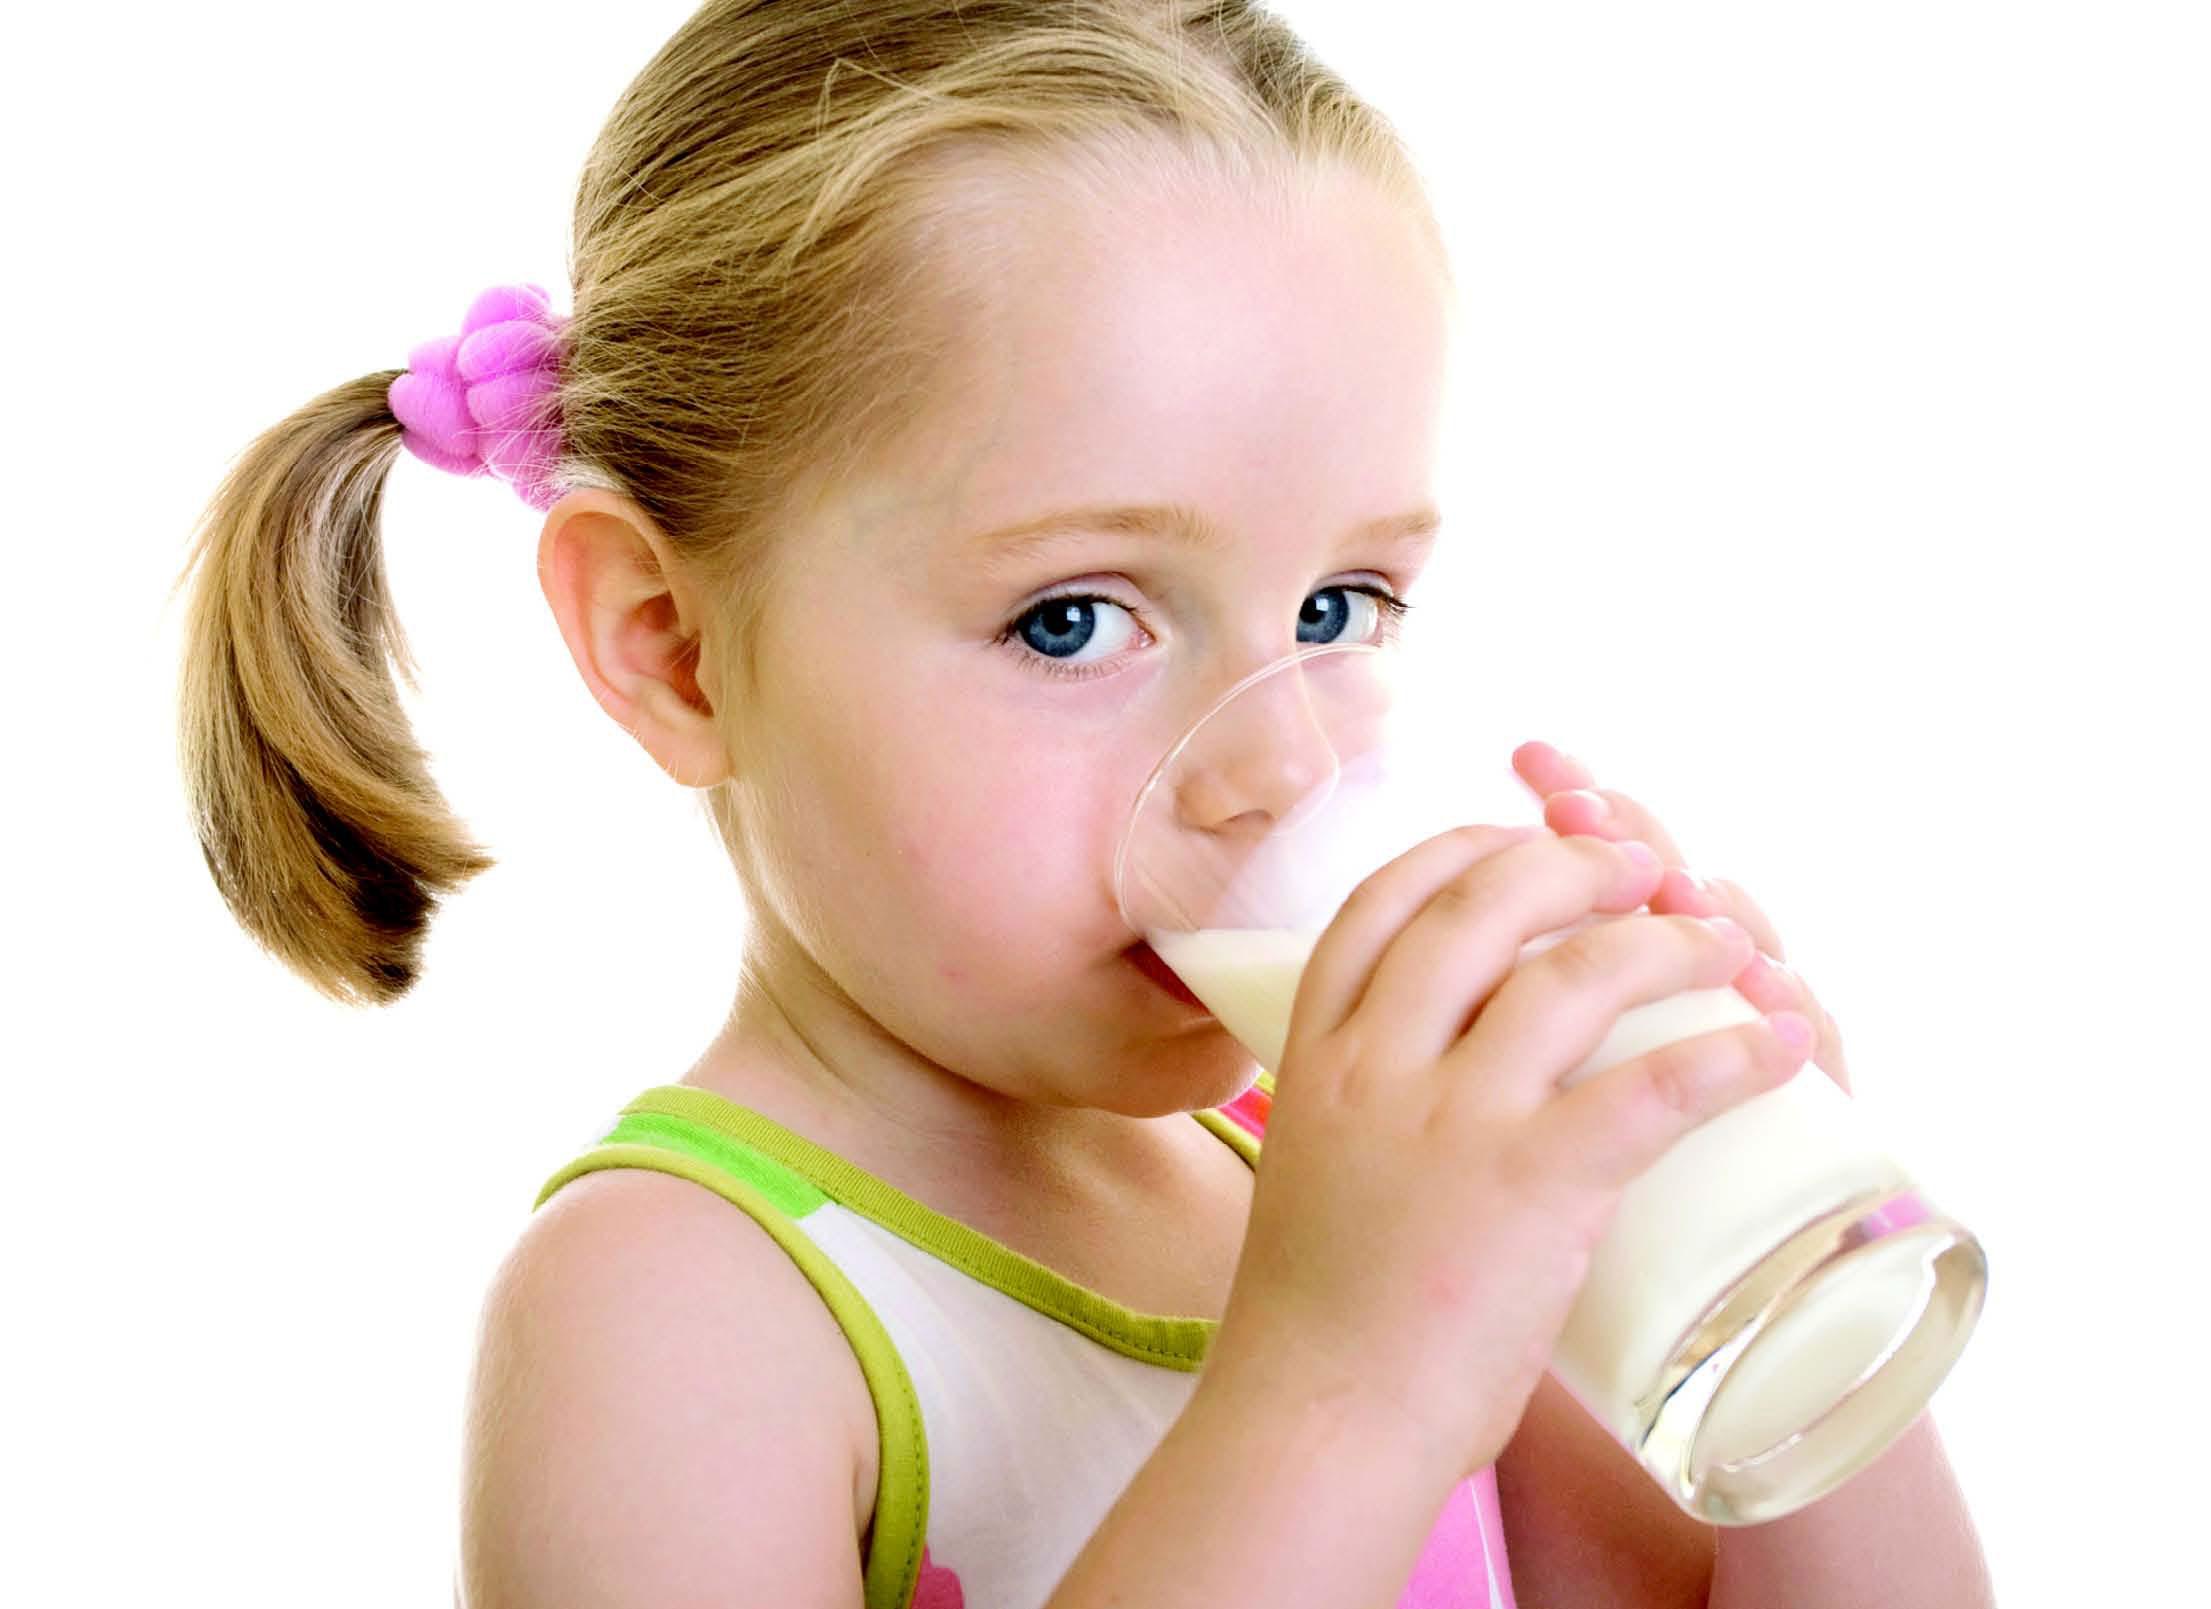 Температура 39 у ребенка без признаков простуды